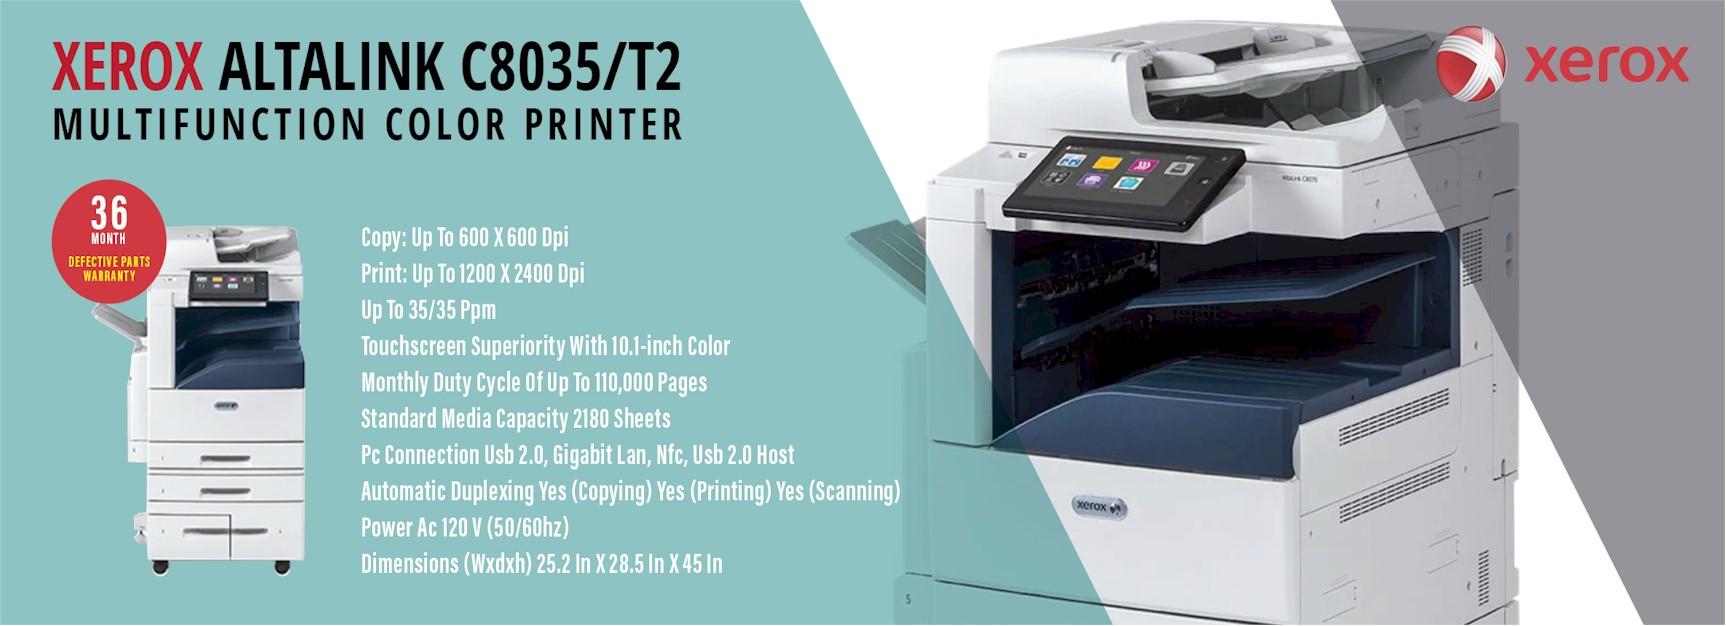 Xerox AltaLink C8035/T2 - Multifunction Color Printer